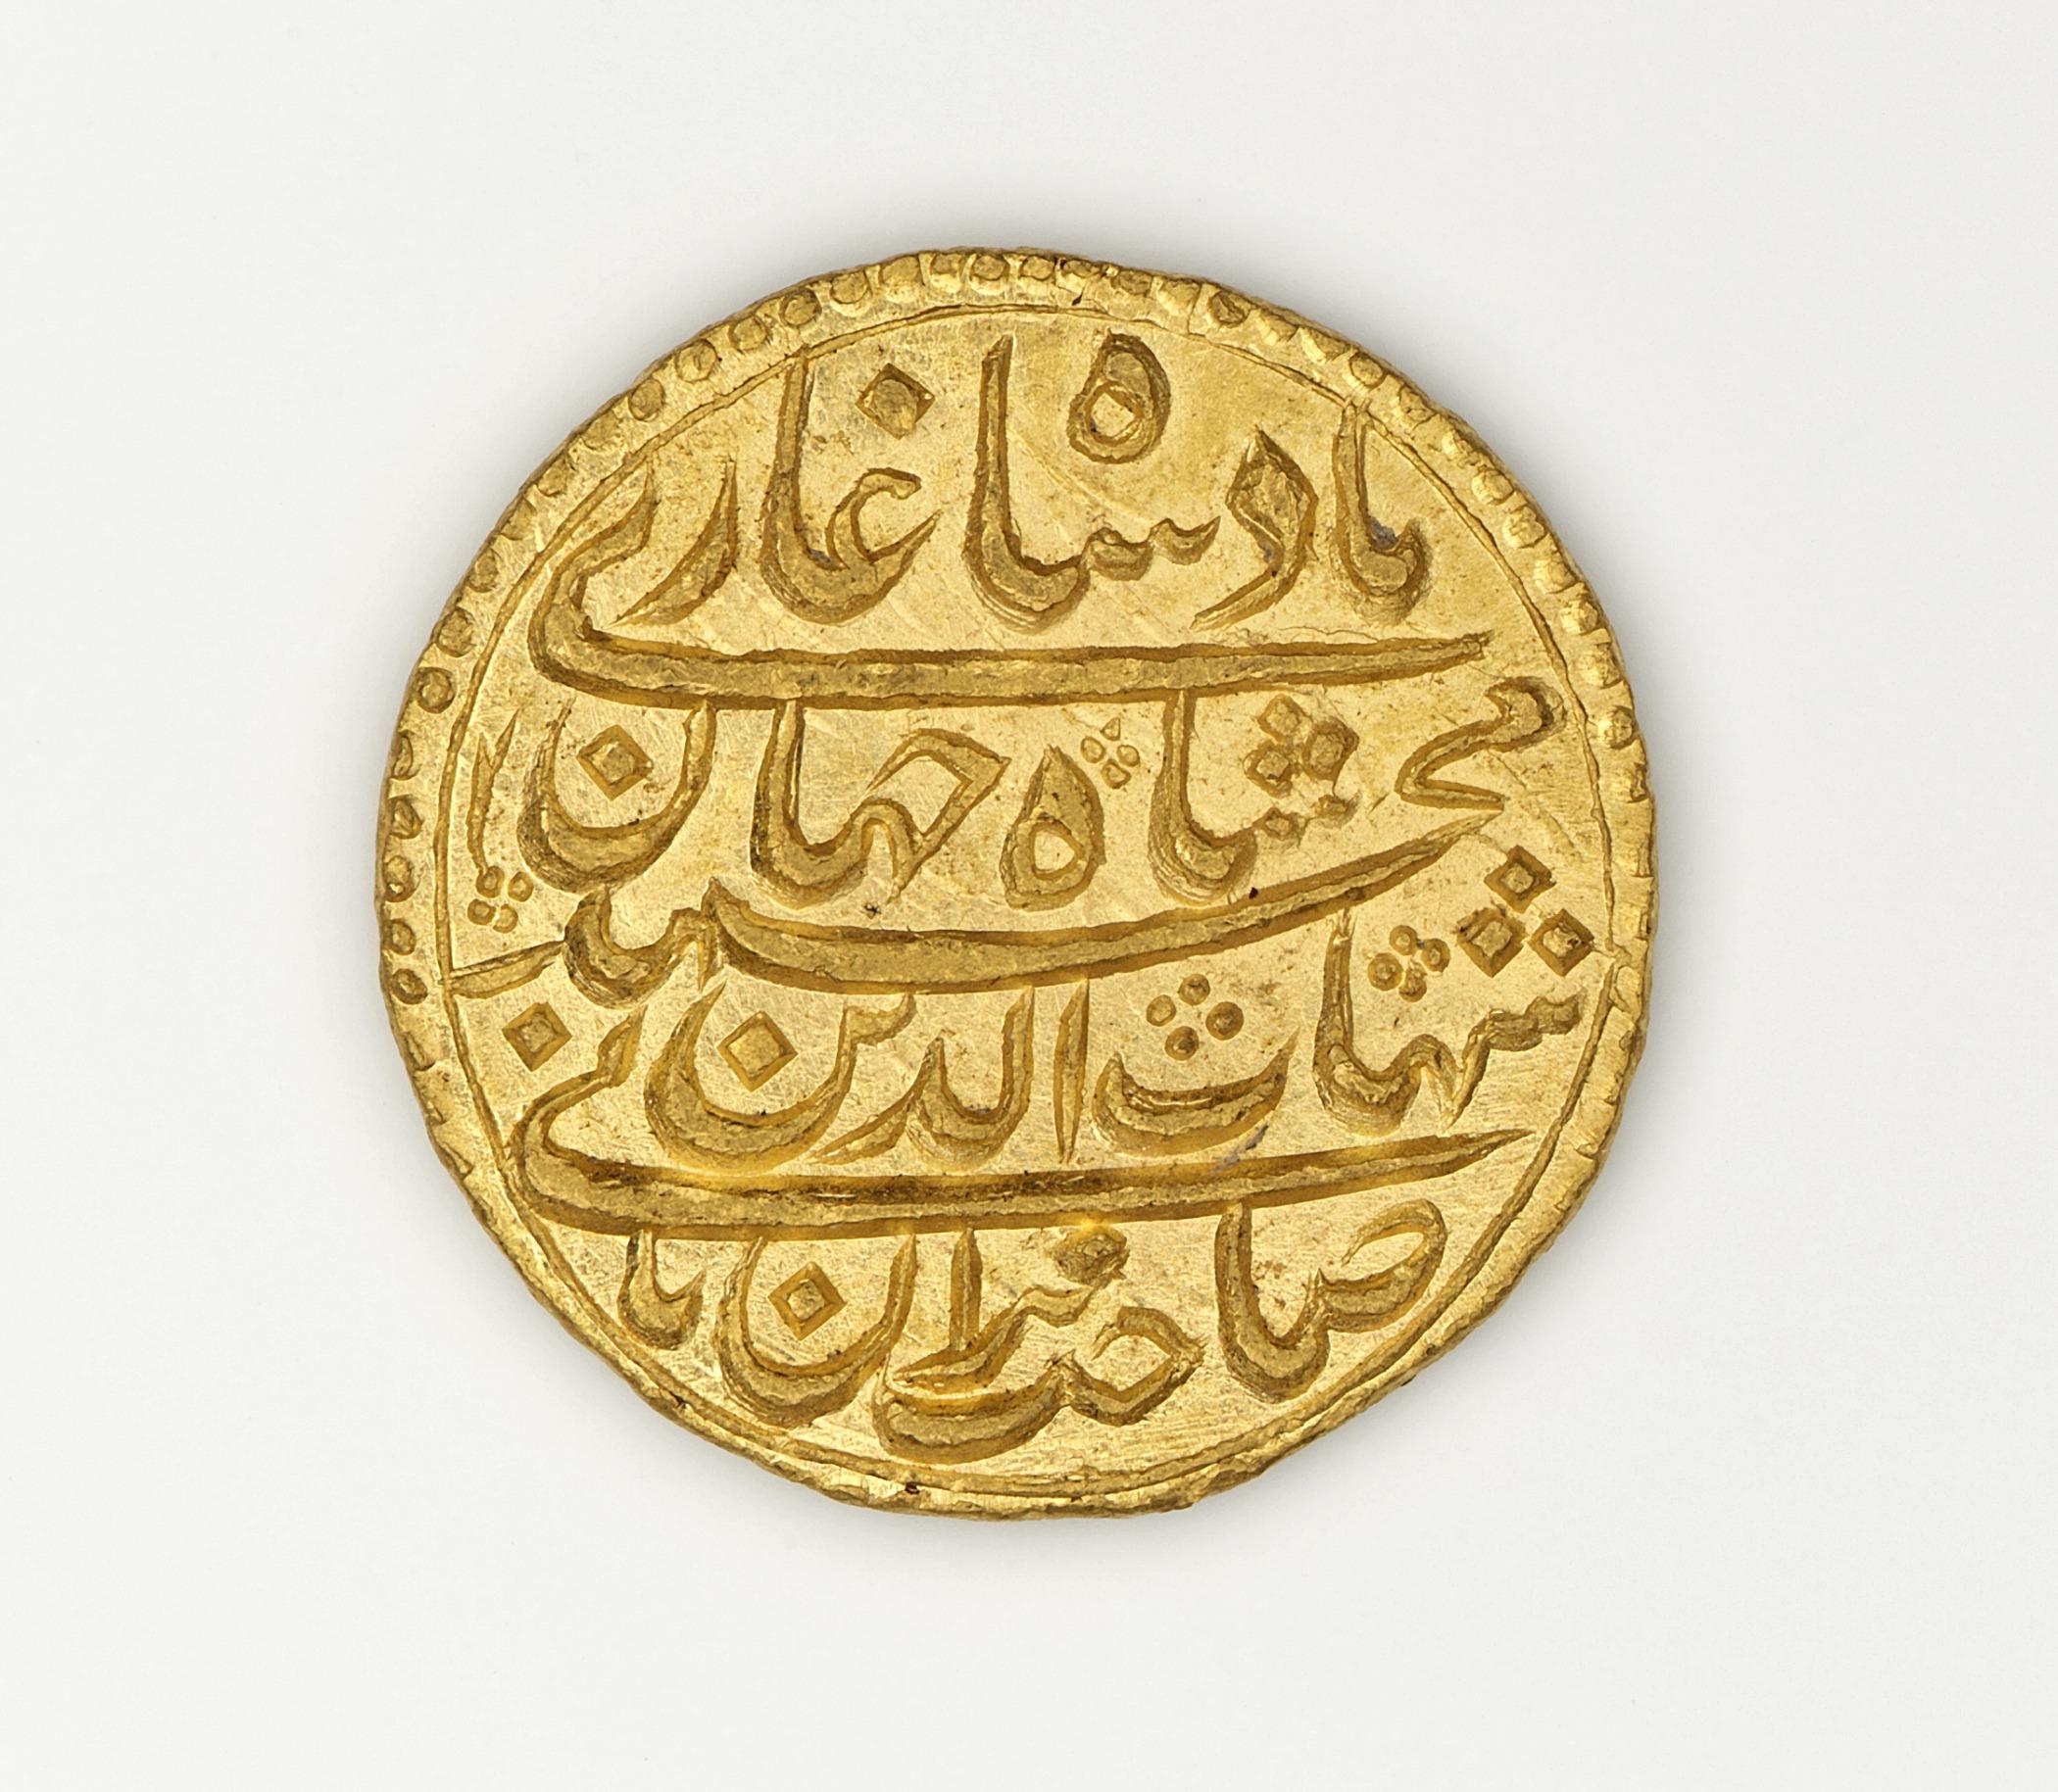 mohur of shah jahan (r. 1628-1658) lacma m.77.55.12 (2 of 2).jpg